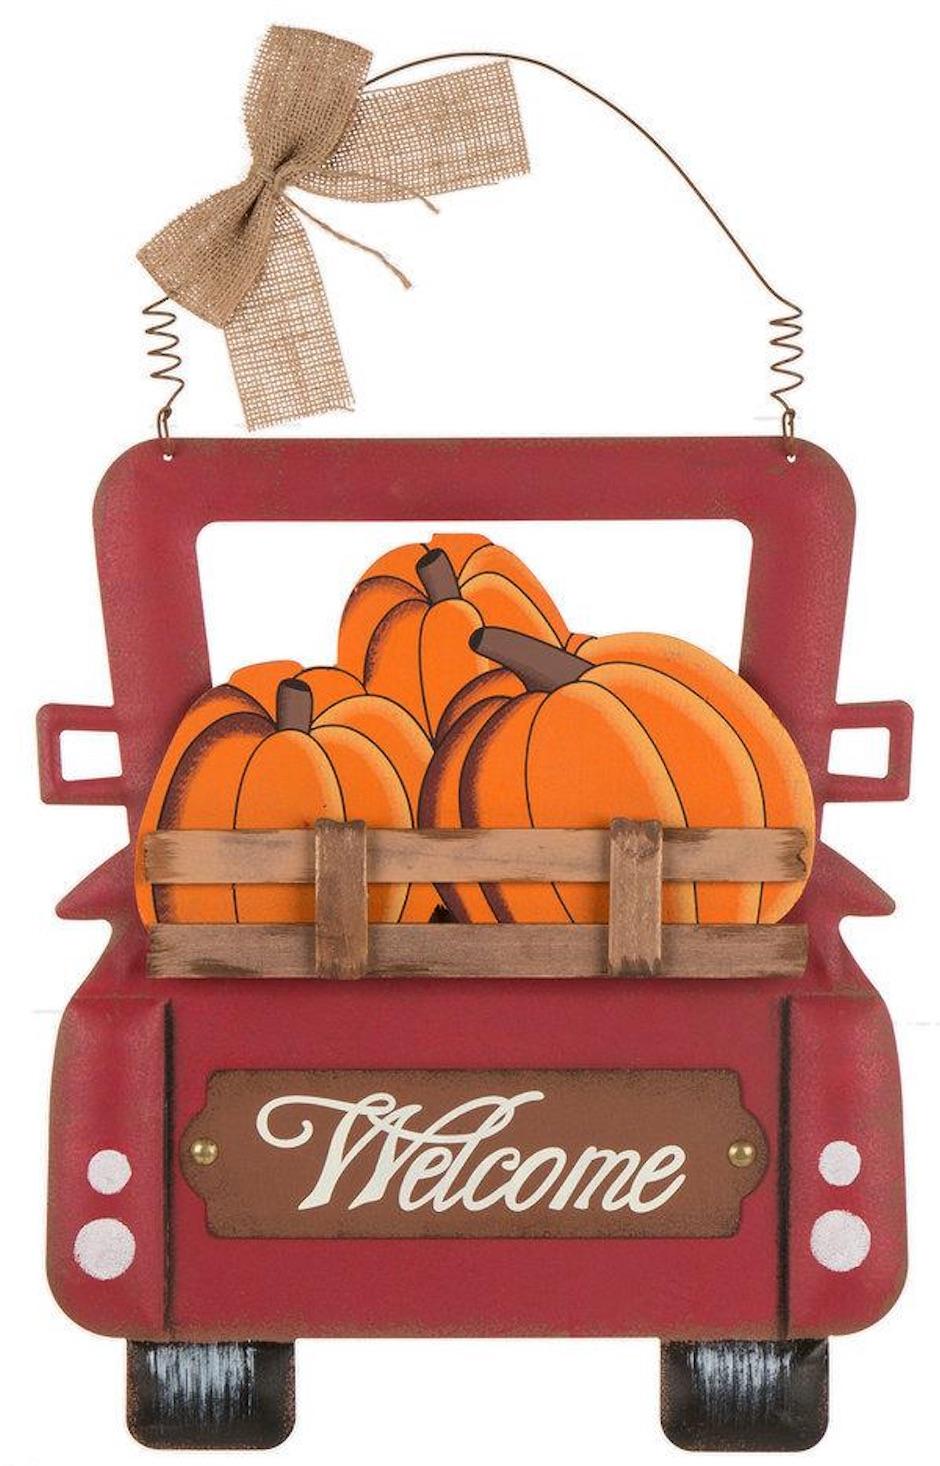 Farmhouse Fall Wall Decor to Welcome Autumn Truck Full Of Pumpkins Wall Decor #Farmhouse #FallWallDecor #FarmhouseWallDecor #RusticDecor #CountryDecor #FallDecor #AutumnDecor #FallWallArt